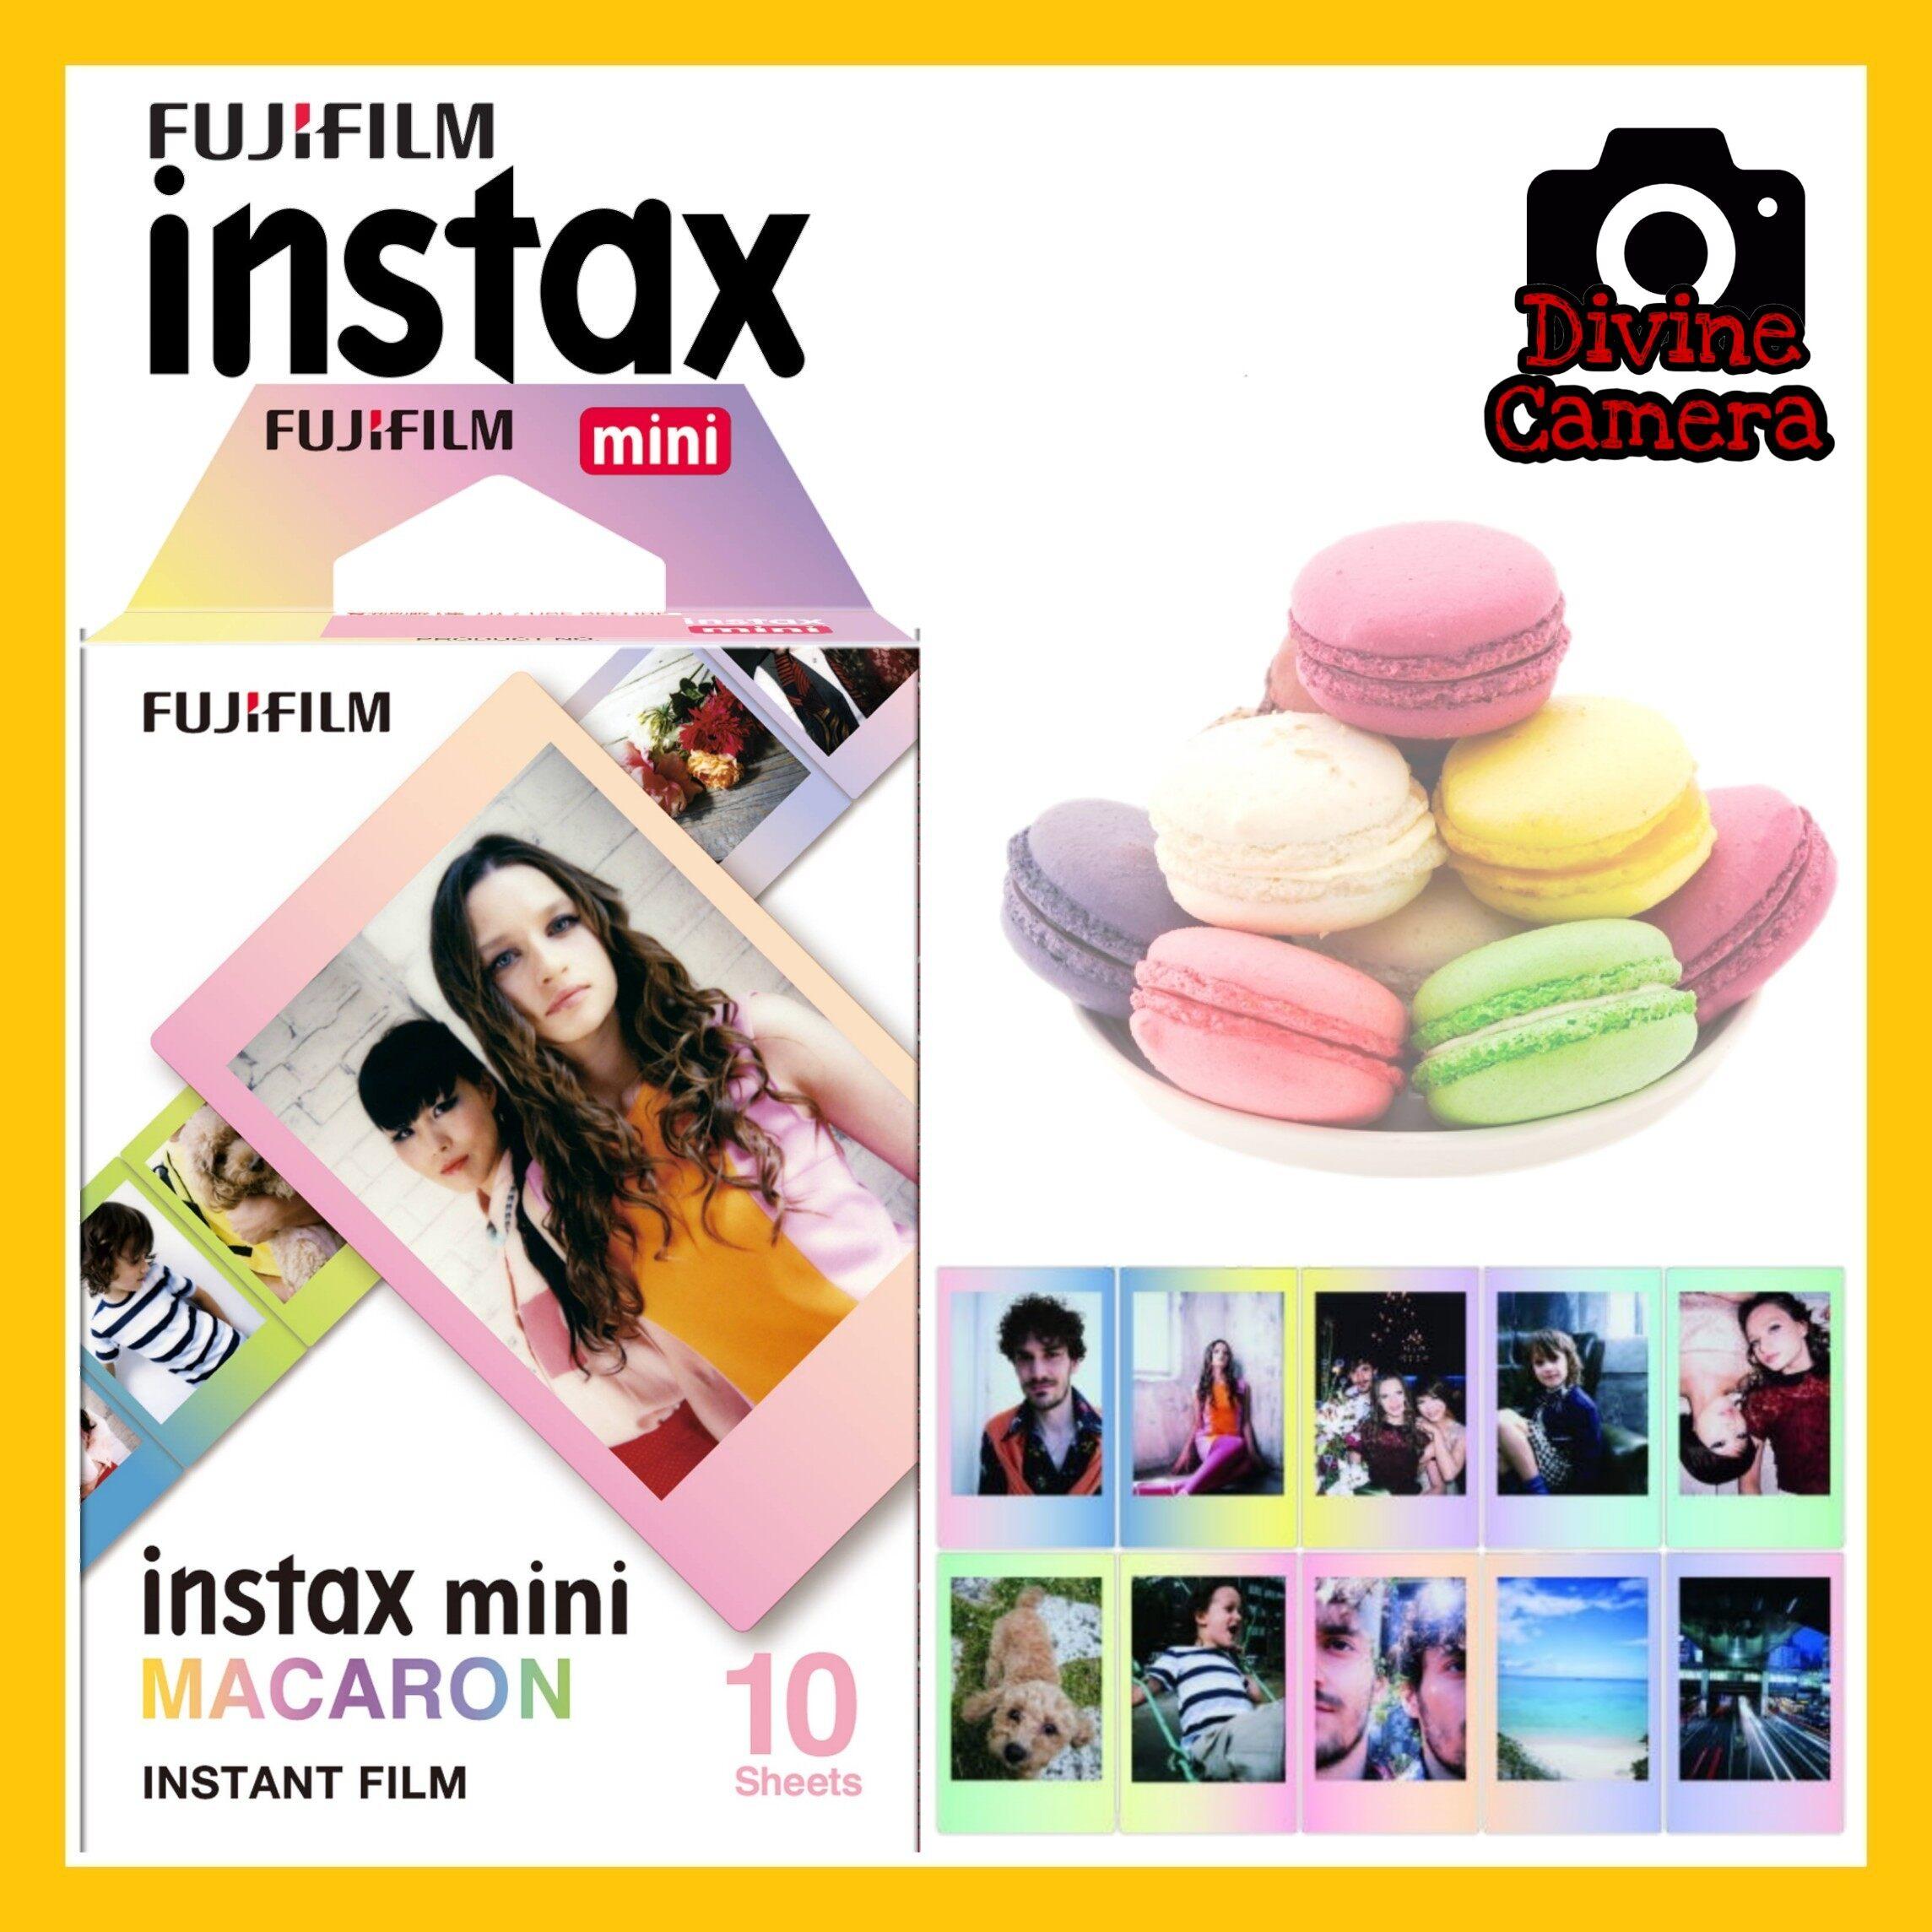 FUJIFILM INSTAX Mini Macaron Instant Film (10 Sheets)